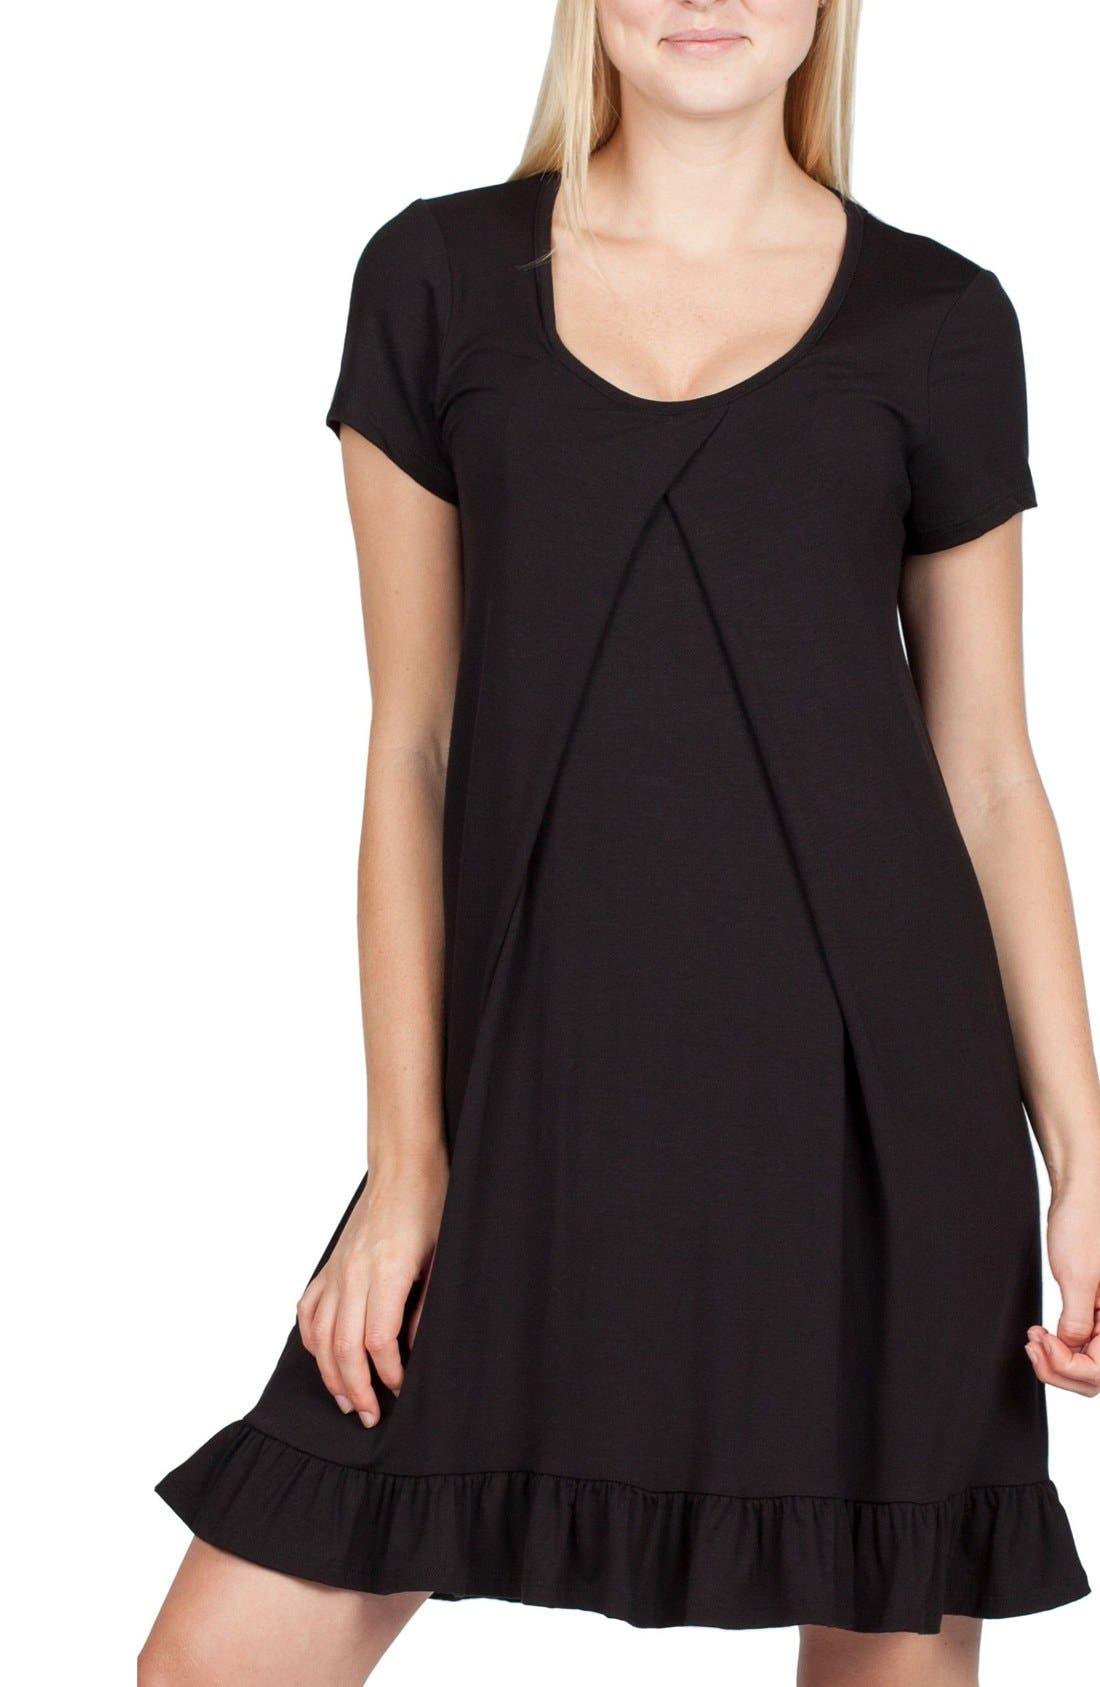 Savi Mom San Francisco Maternity/nursing Nightgown, Black